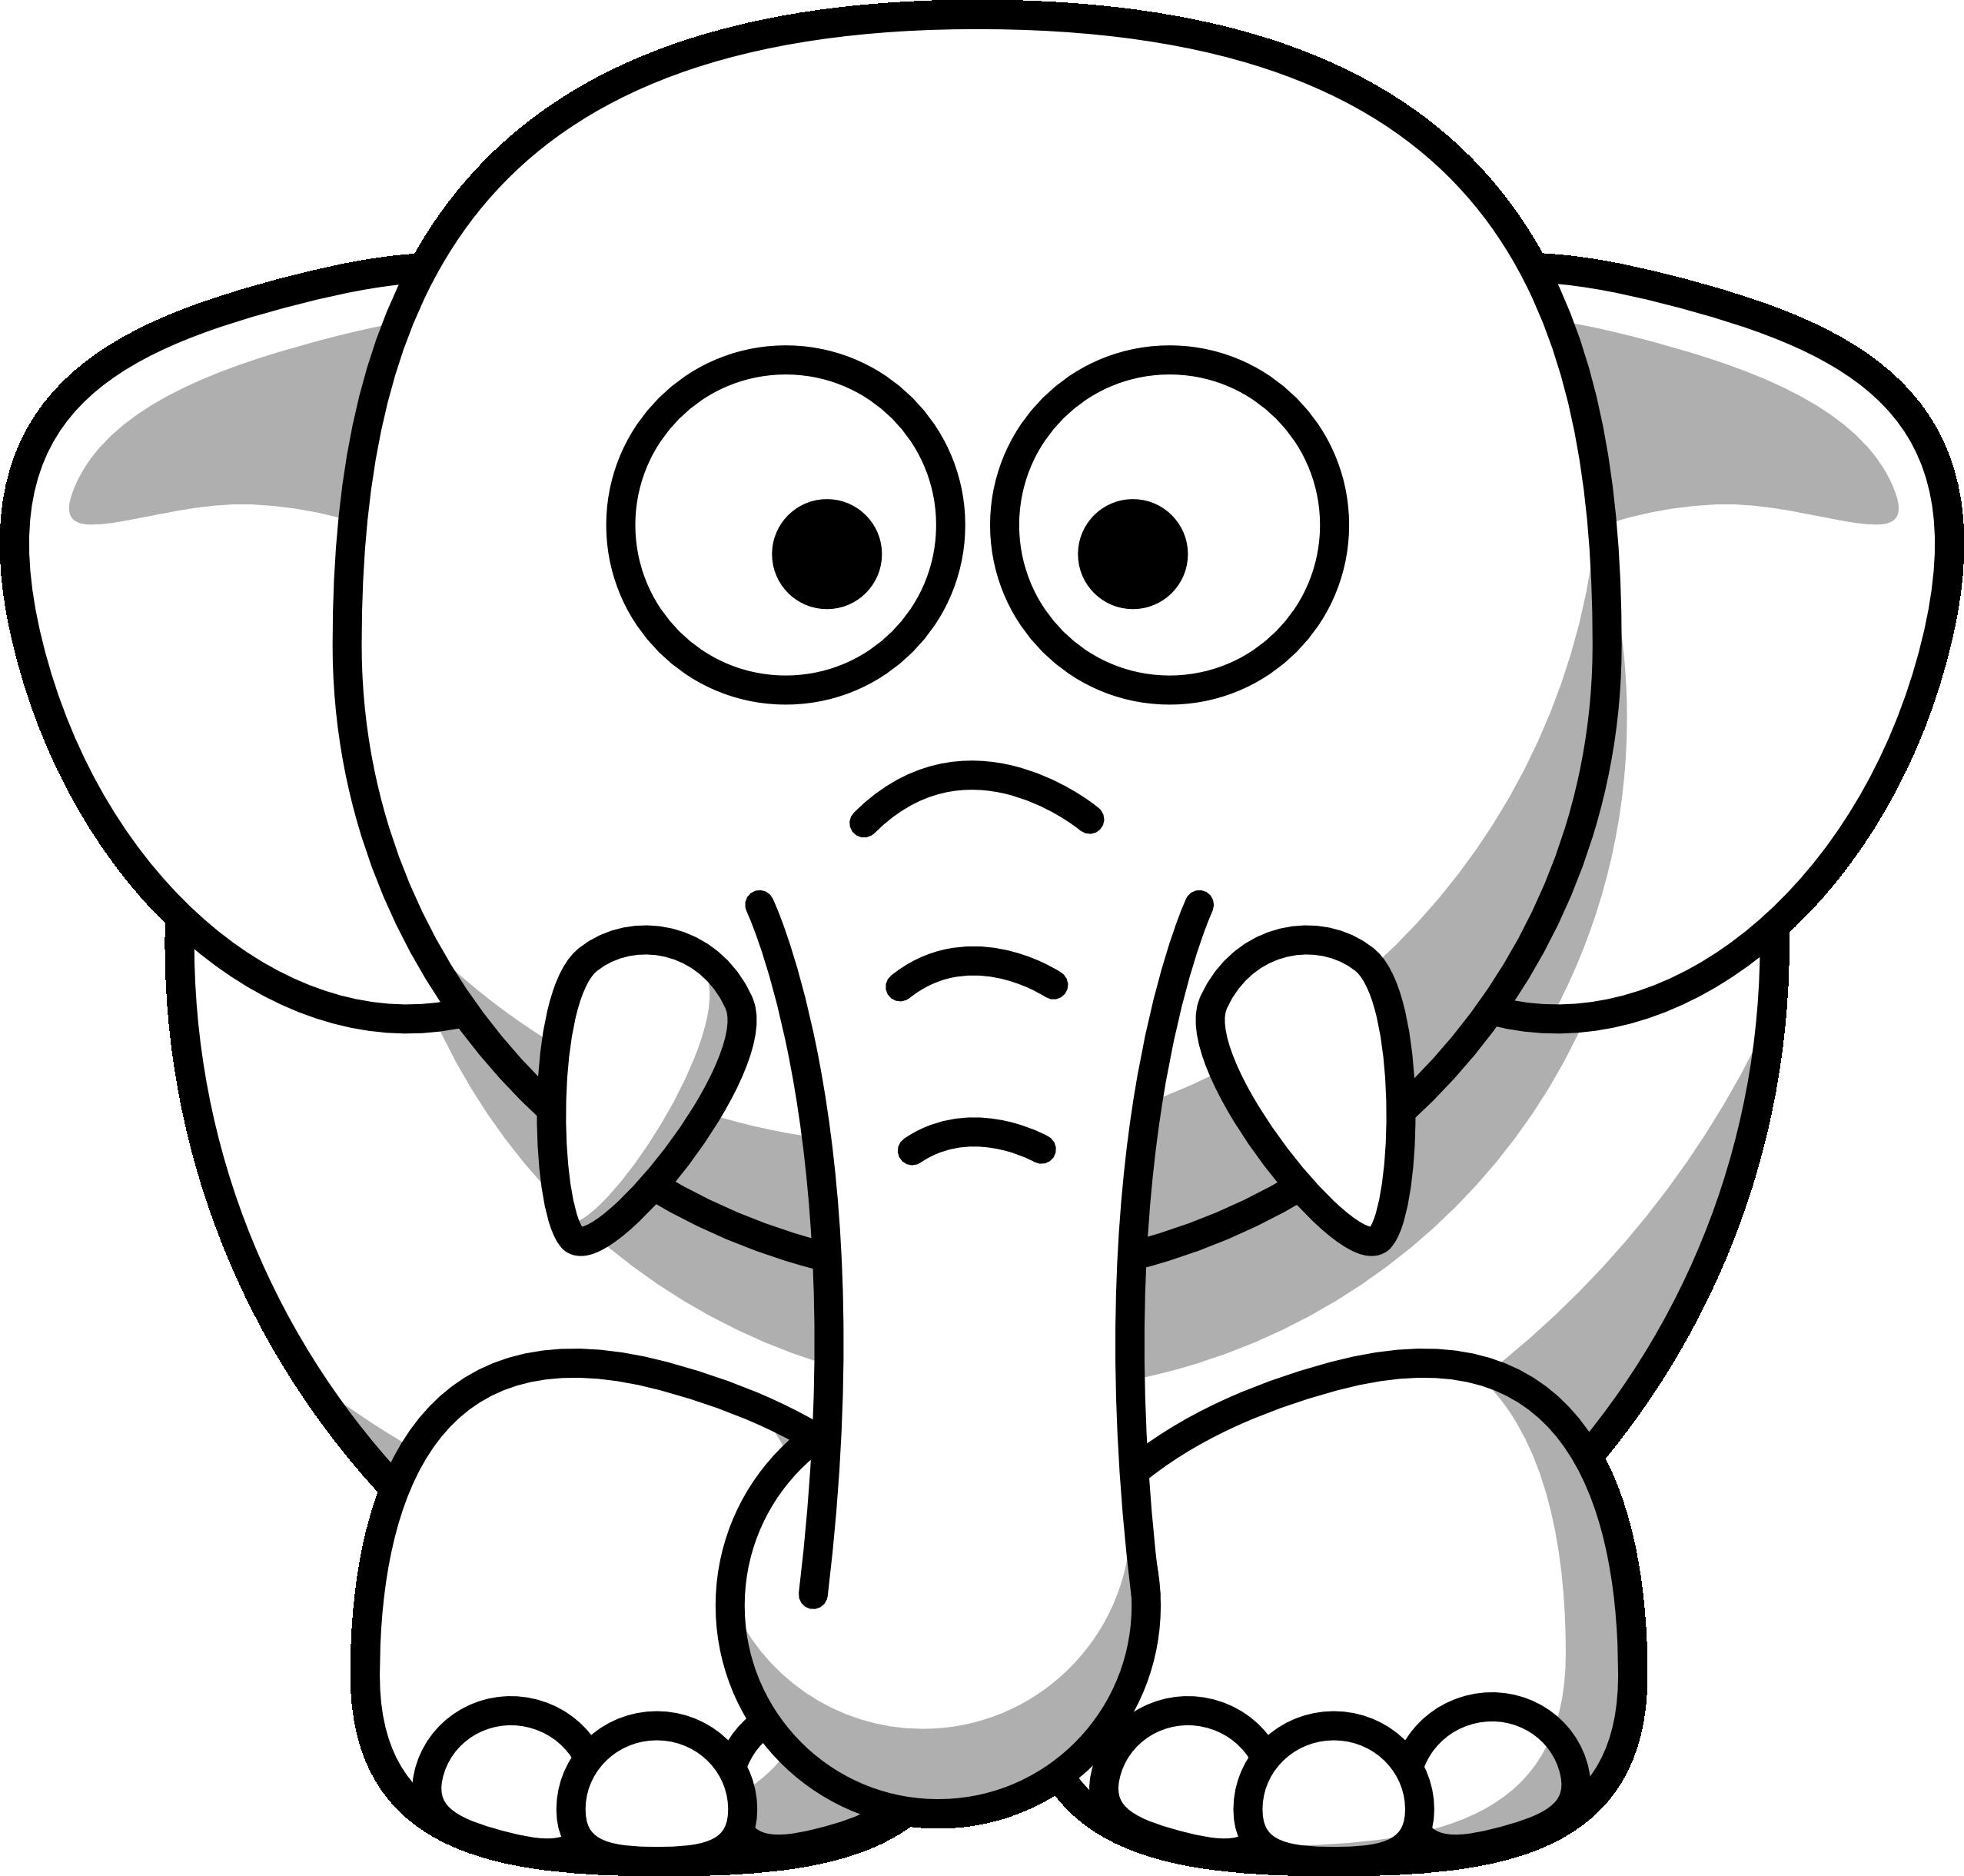 Net Clipart Black And White Elephant Cop-Net Clipart Black And White Elephant Copy Black White Line Art-14